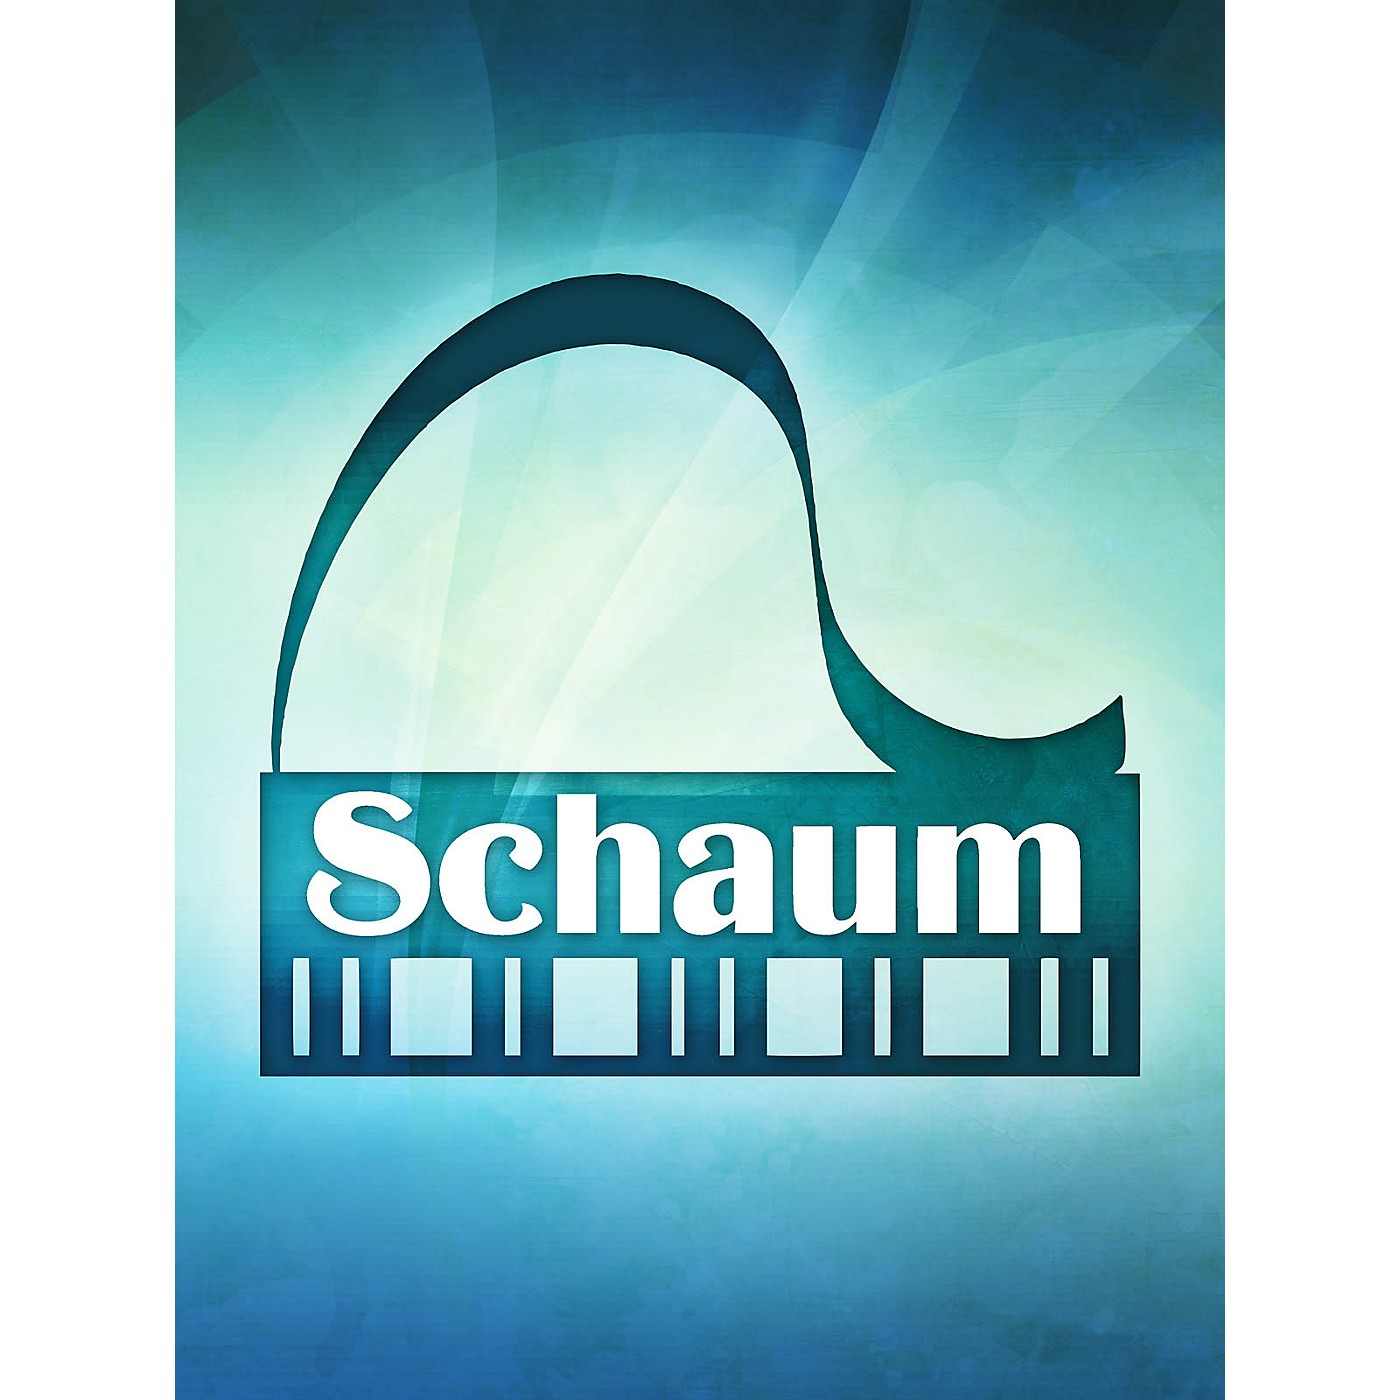 SCHAUM Fingerpower® (Level 2 GM Disk Only) Educational Piano Series Softcover Written by John W. Schaum thumbnail